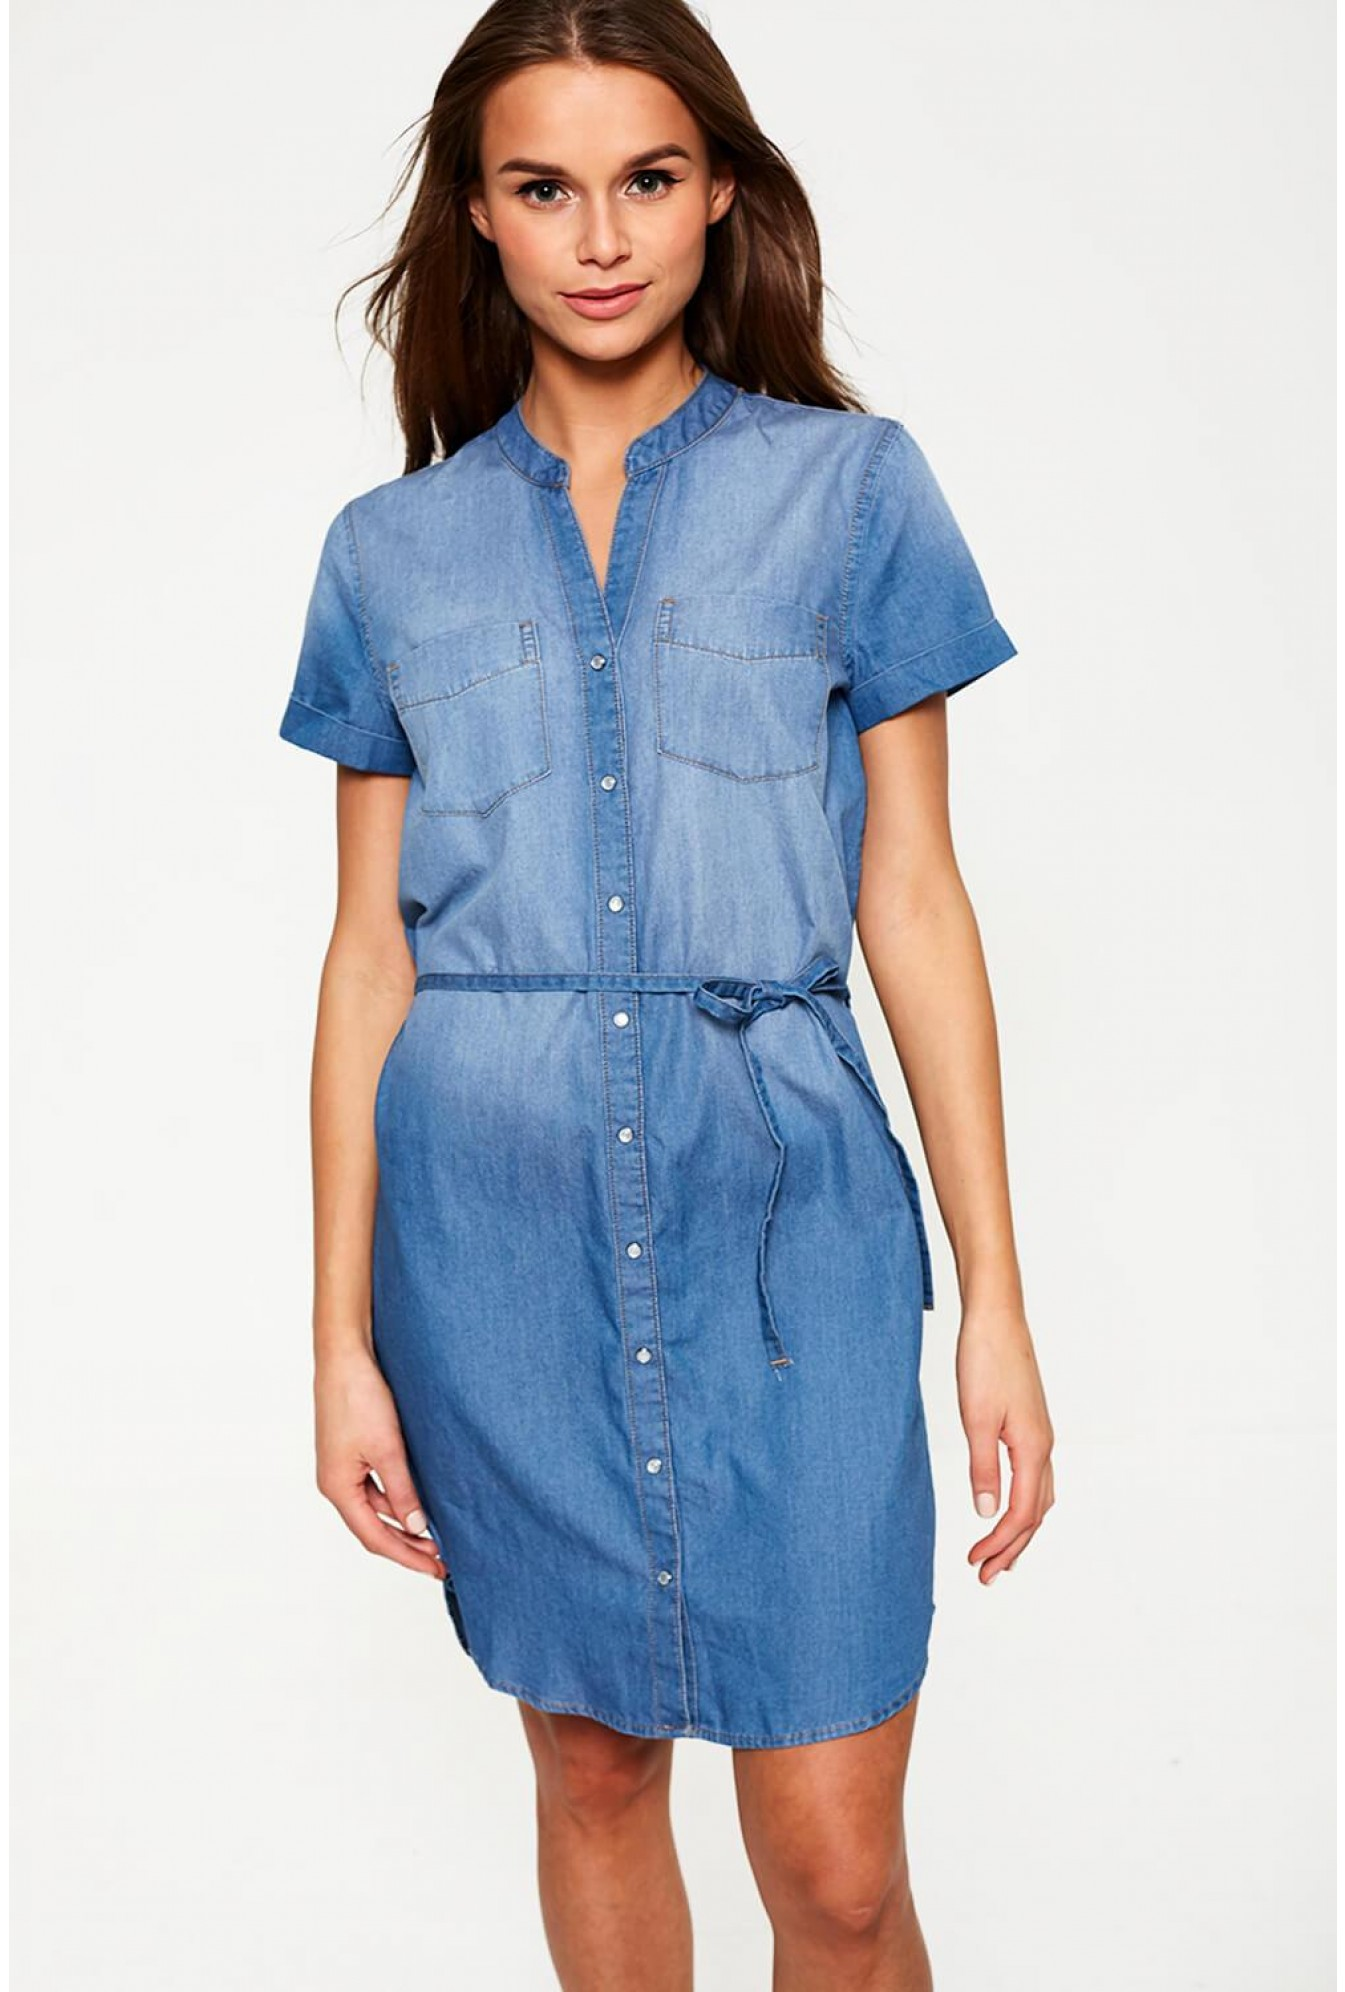 de7fd7754ac Short Sleeve Denim Shirt Dress in Mid Wash Blue